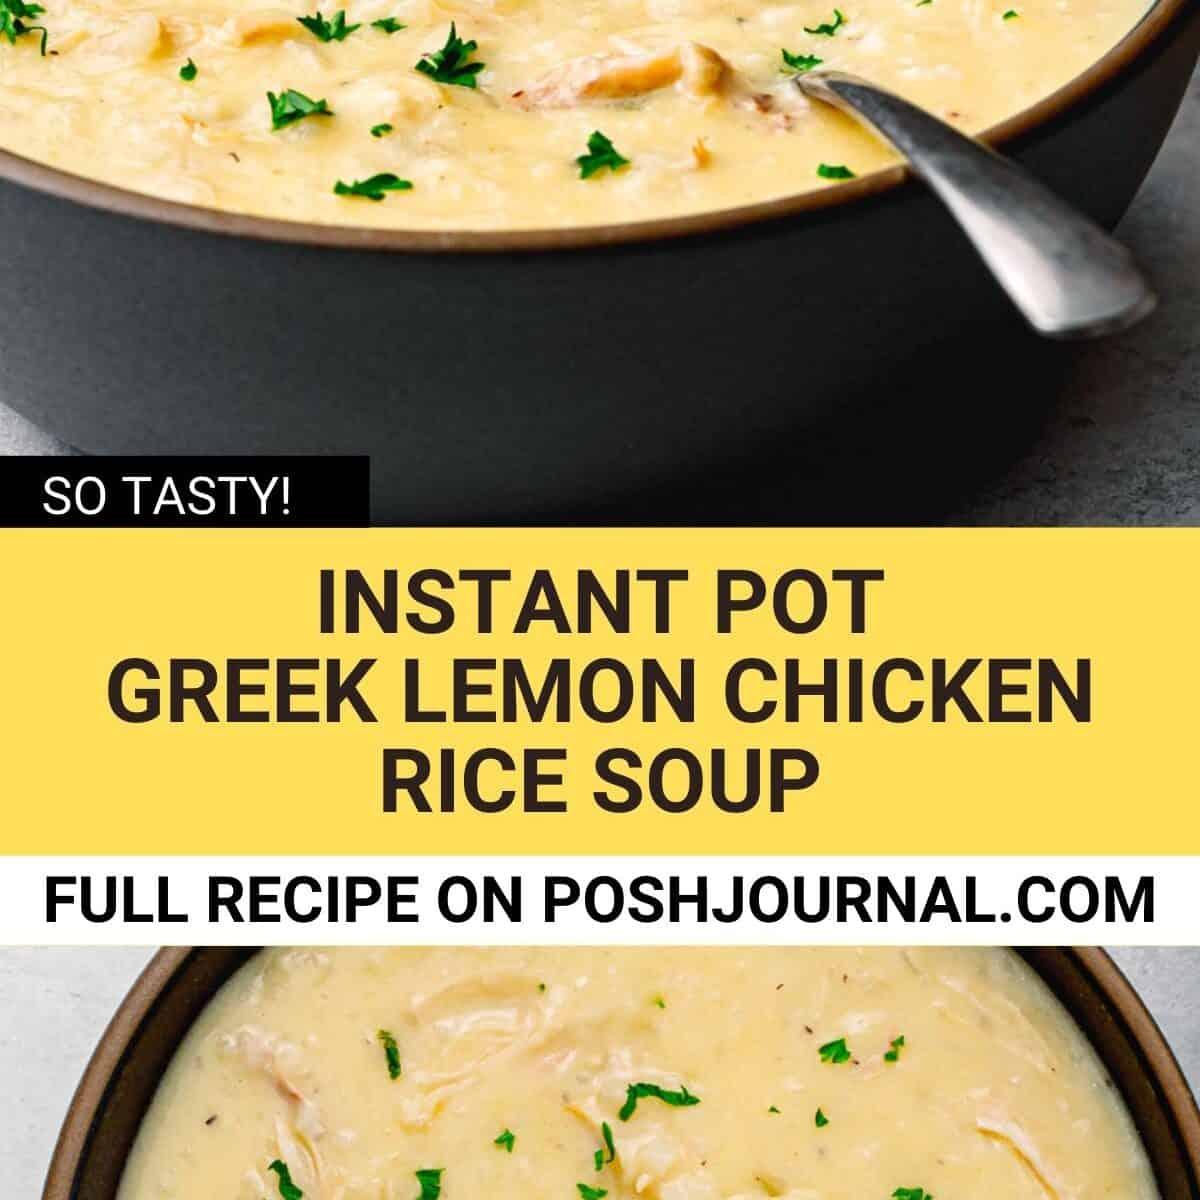 Instant Pot Greek Chicken Lemon Rice Soup, Avgolemono